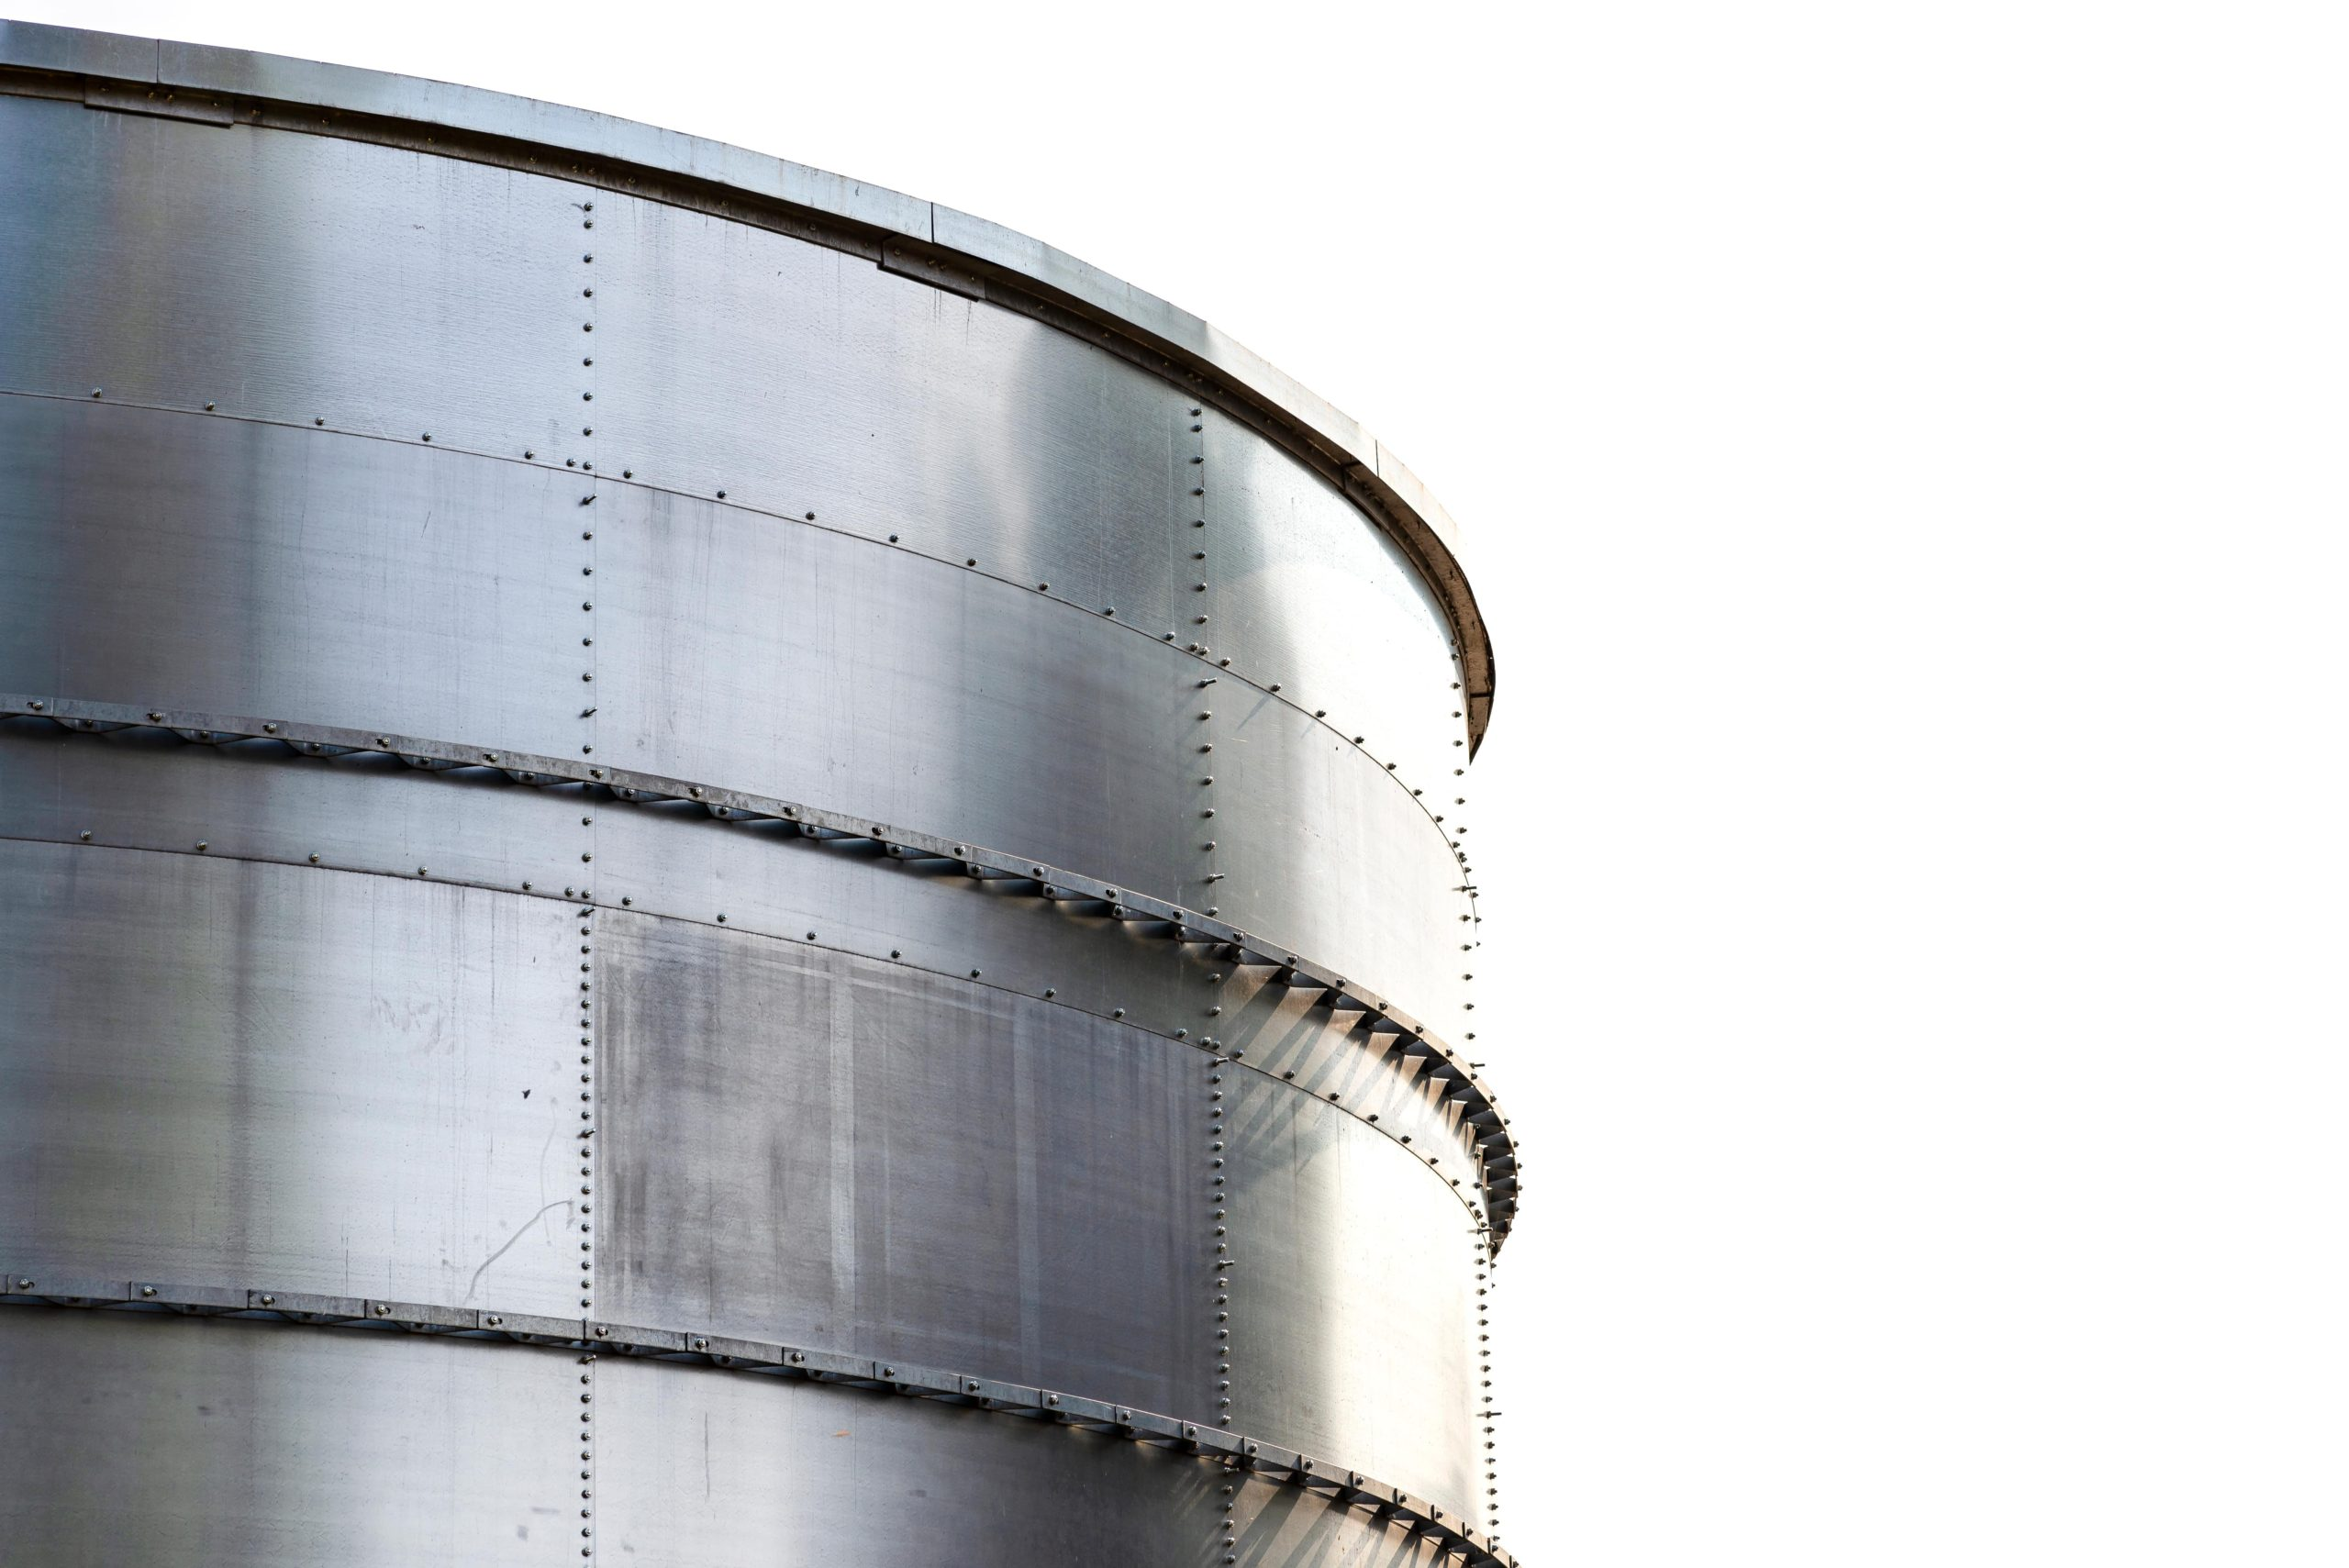 silos-silo-industrial-industrial-building-storage-cylinders-steel-metal-storage-oil-tank-architecture_t20_0XjoOg-min